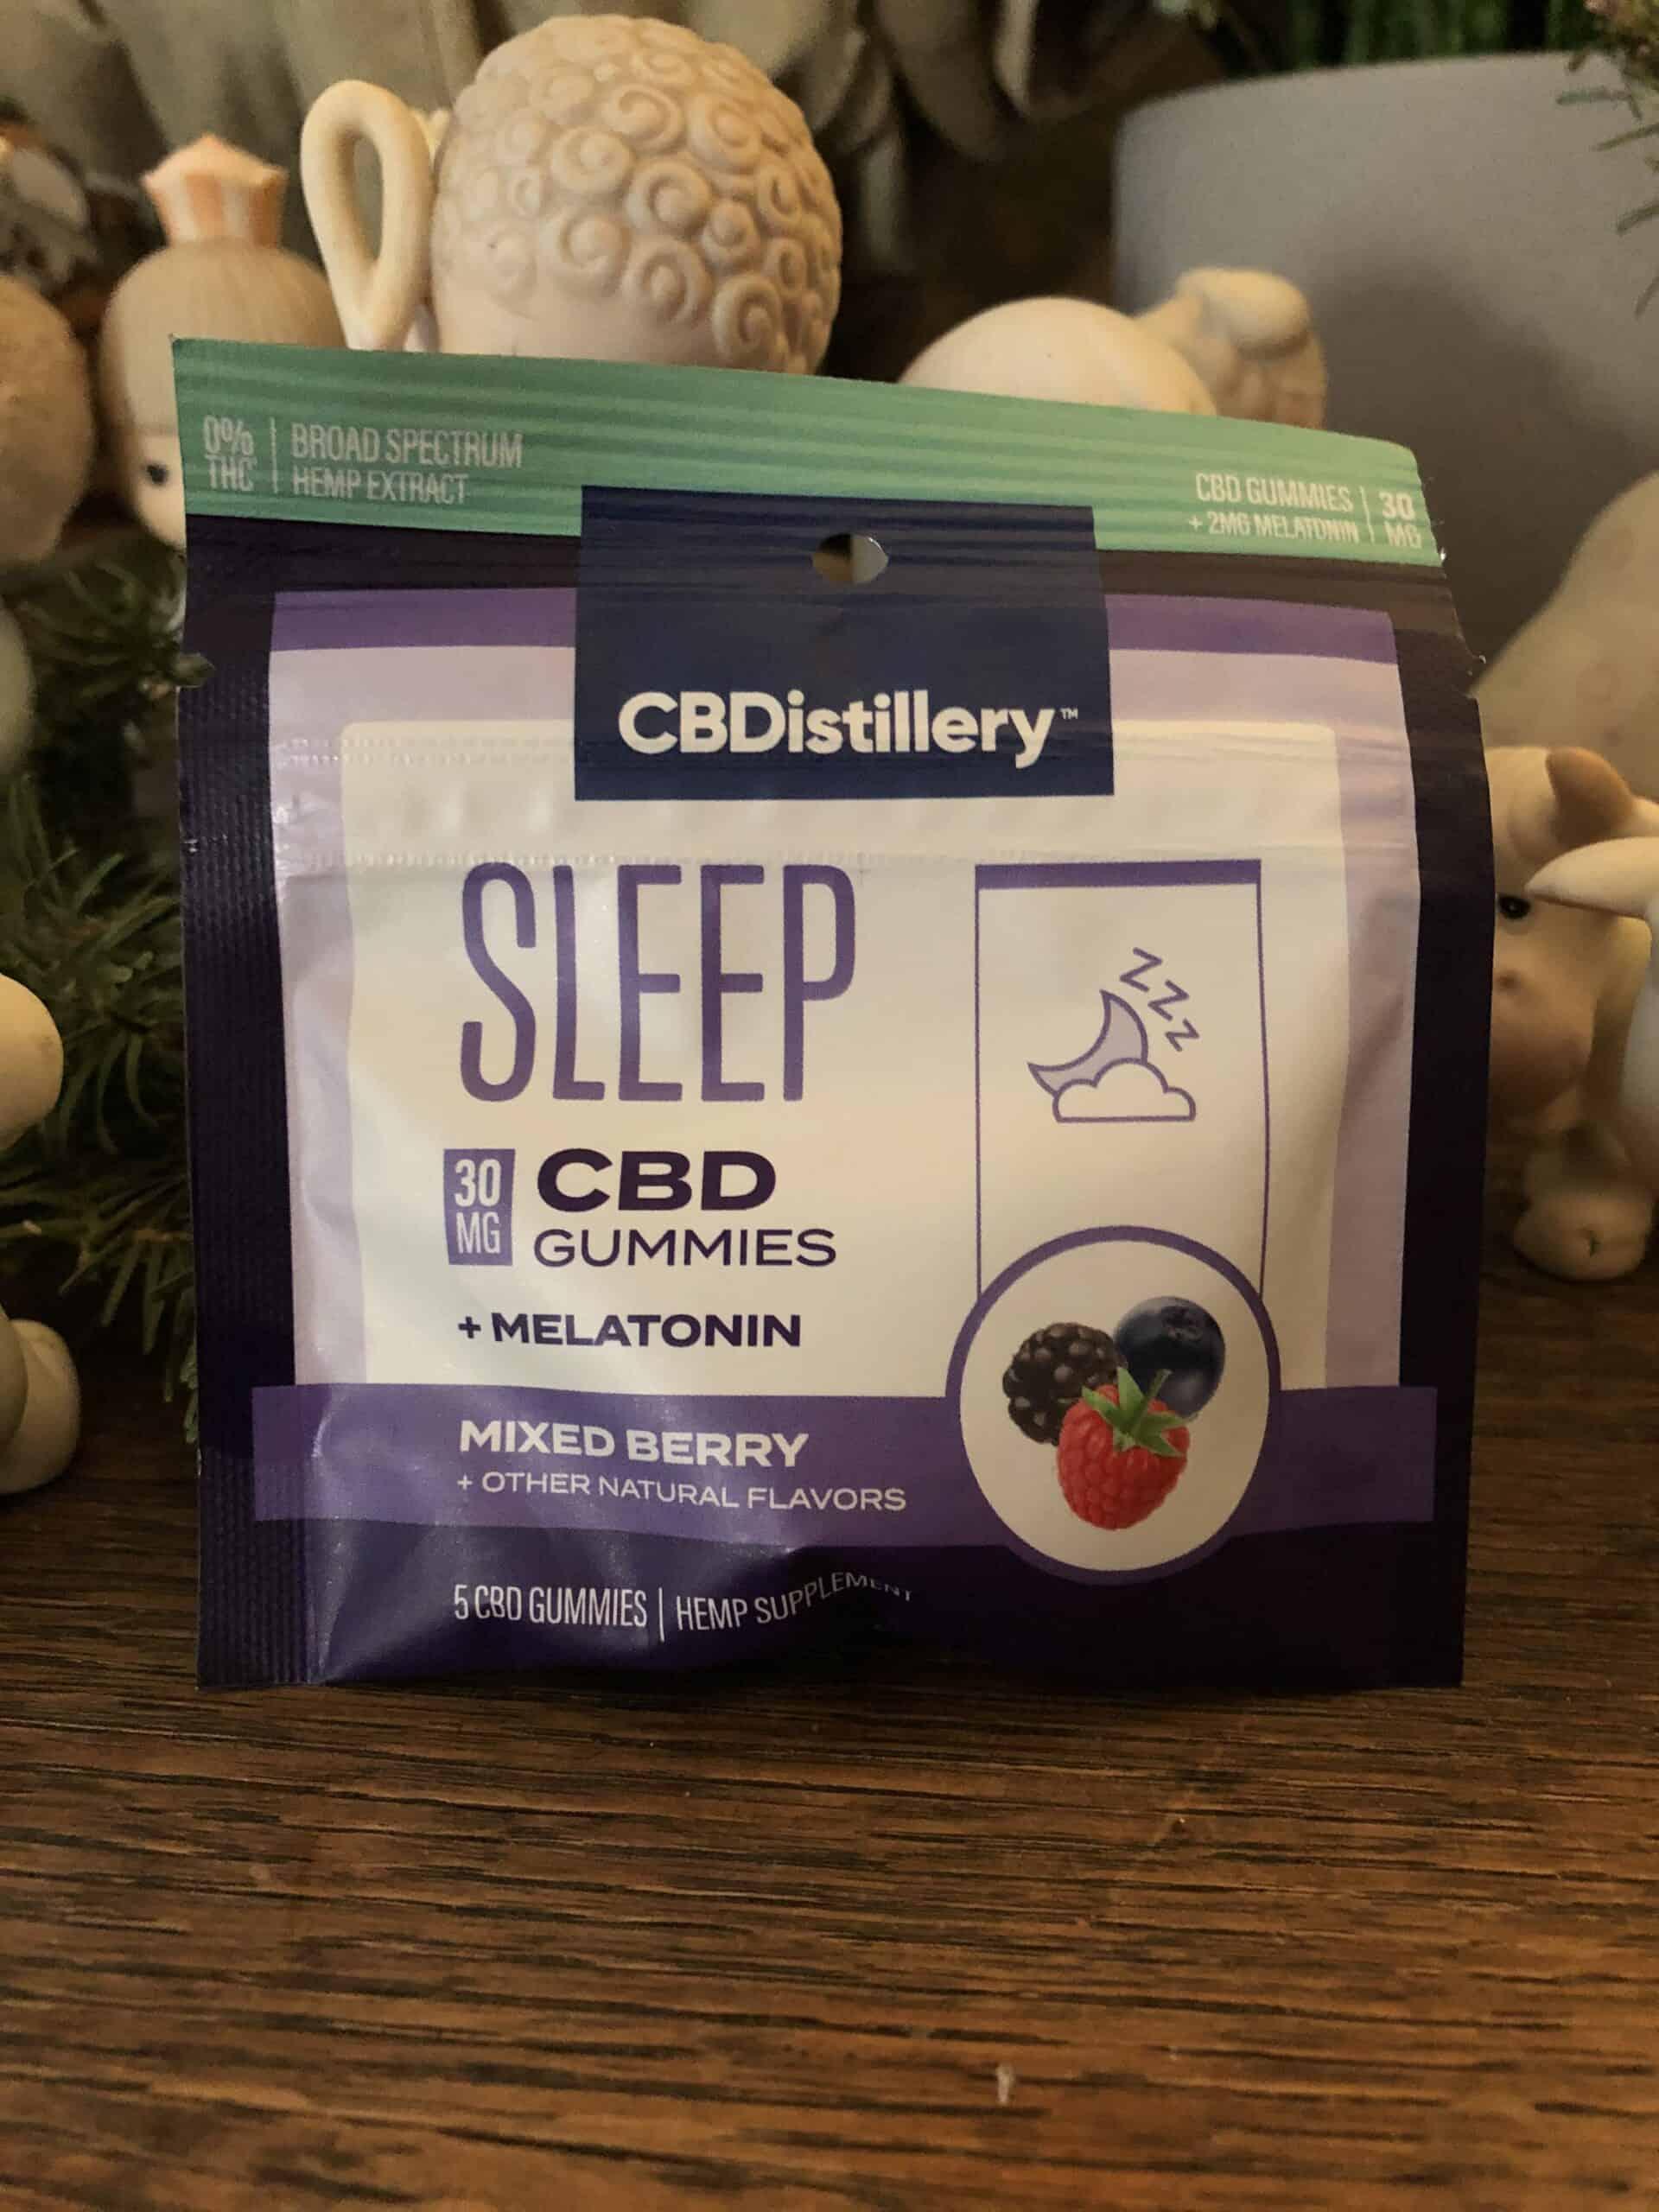 CBDistillery Sleep Gummies with Melatonin